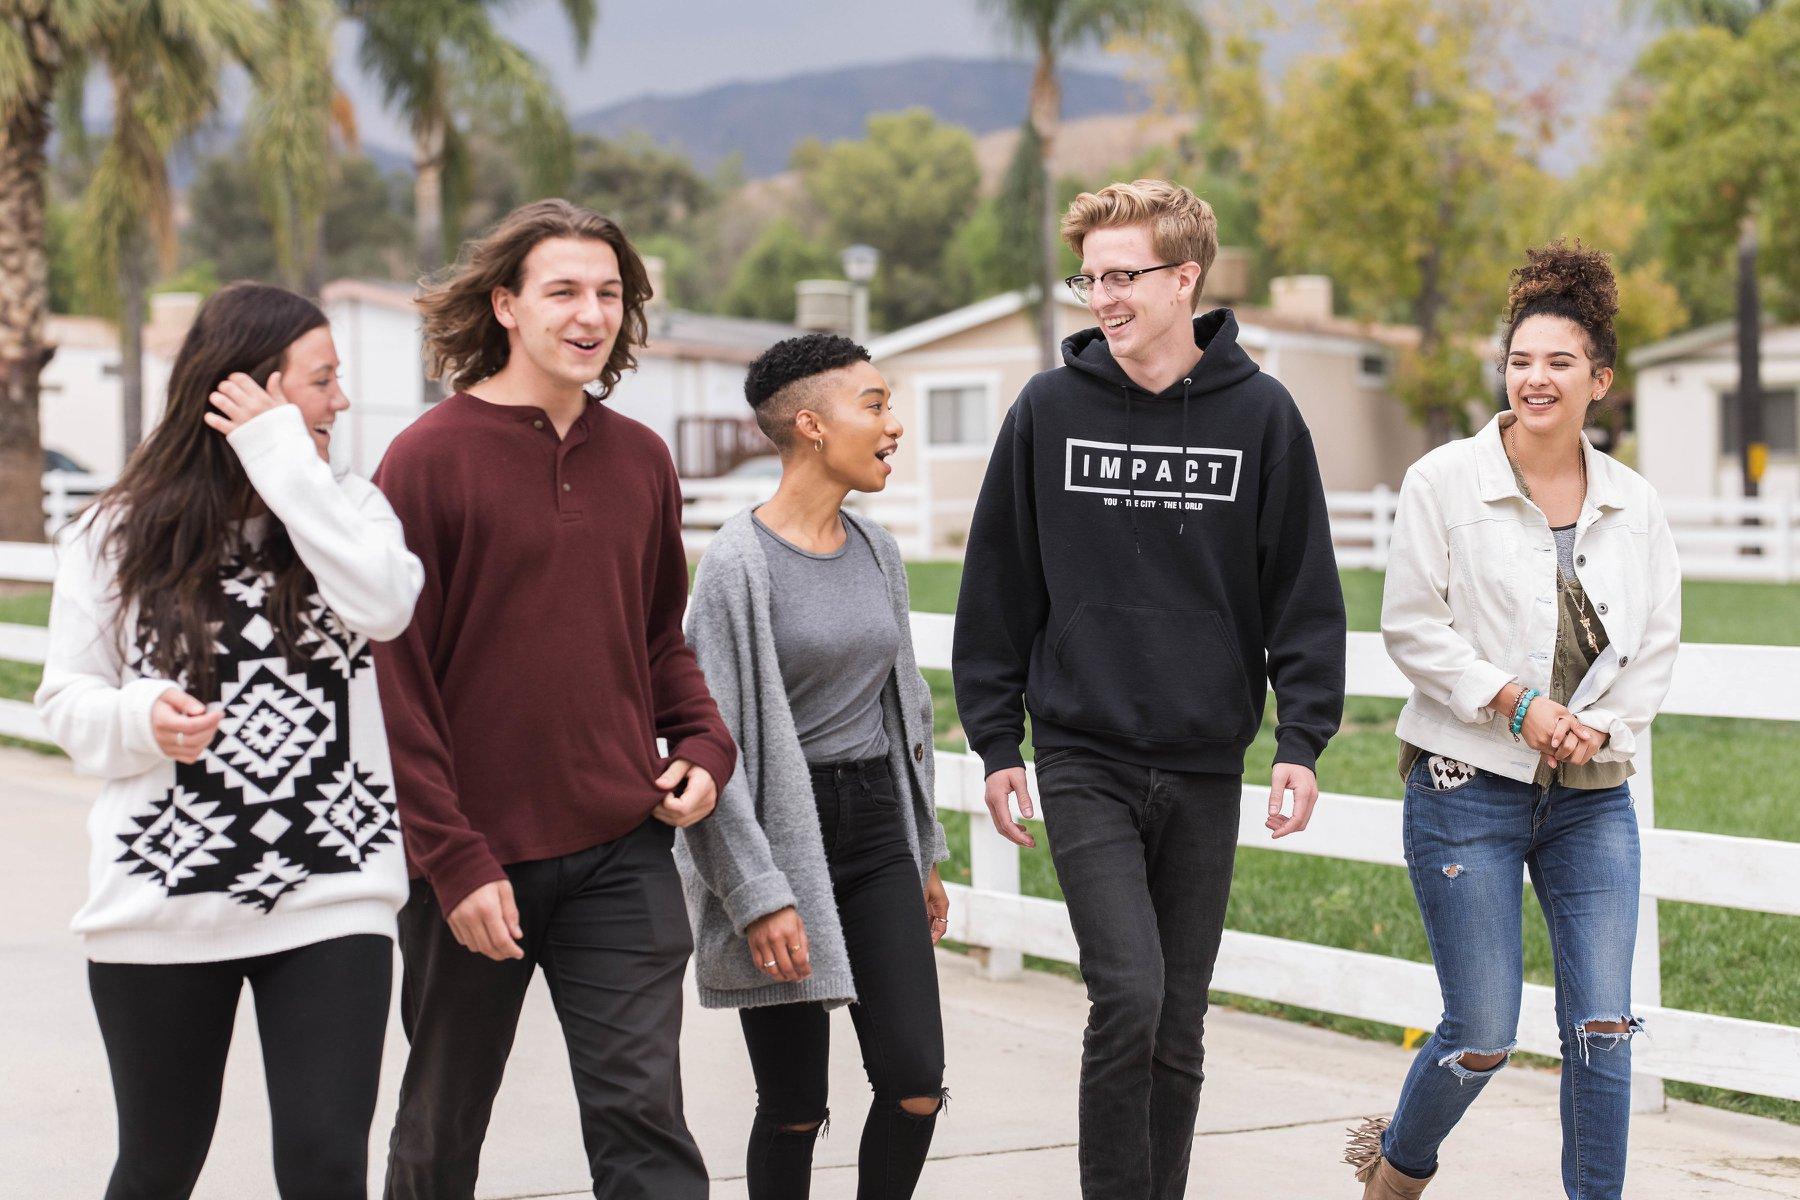 Students at YWAM Los Angeles